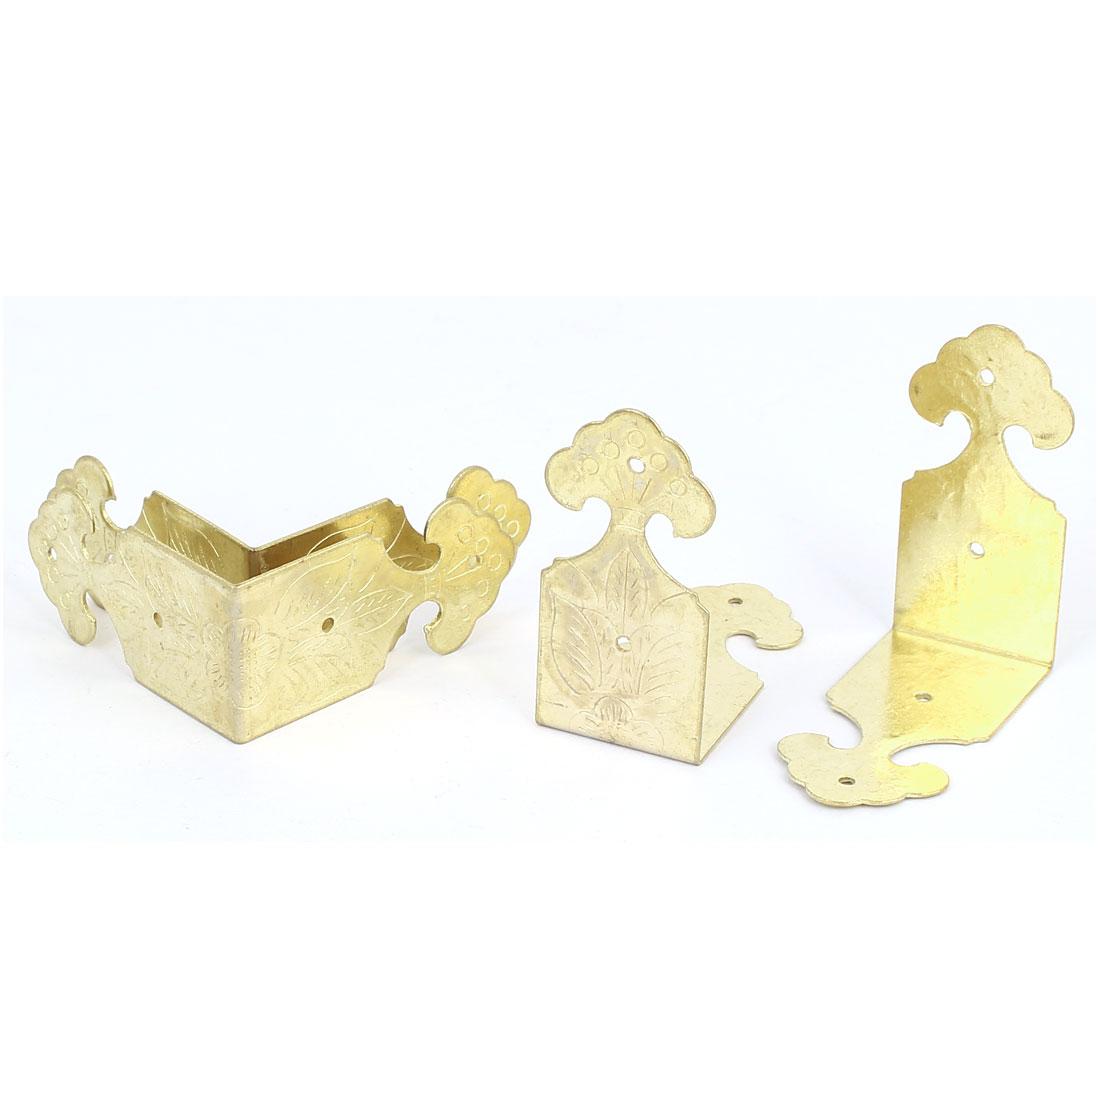 Chest Gift Box Desk Edge Cover Corner Protector Guard 46mm x 22mm 4PCS